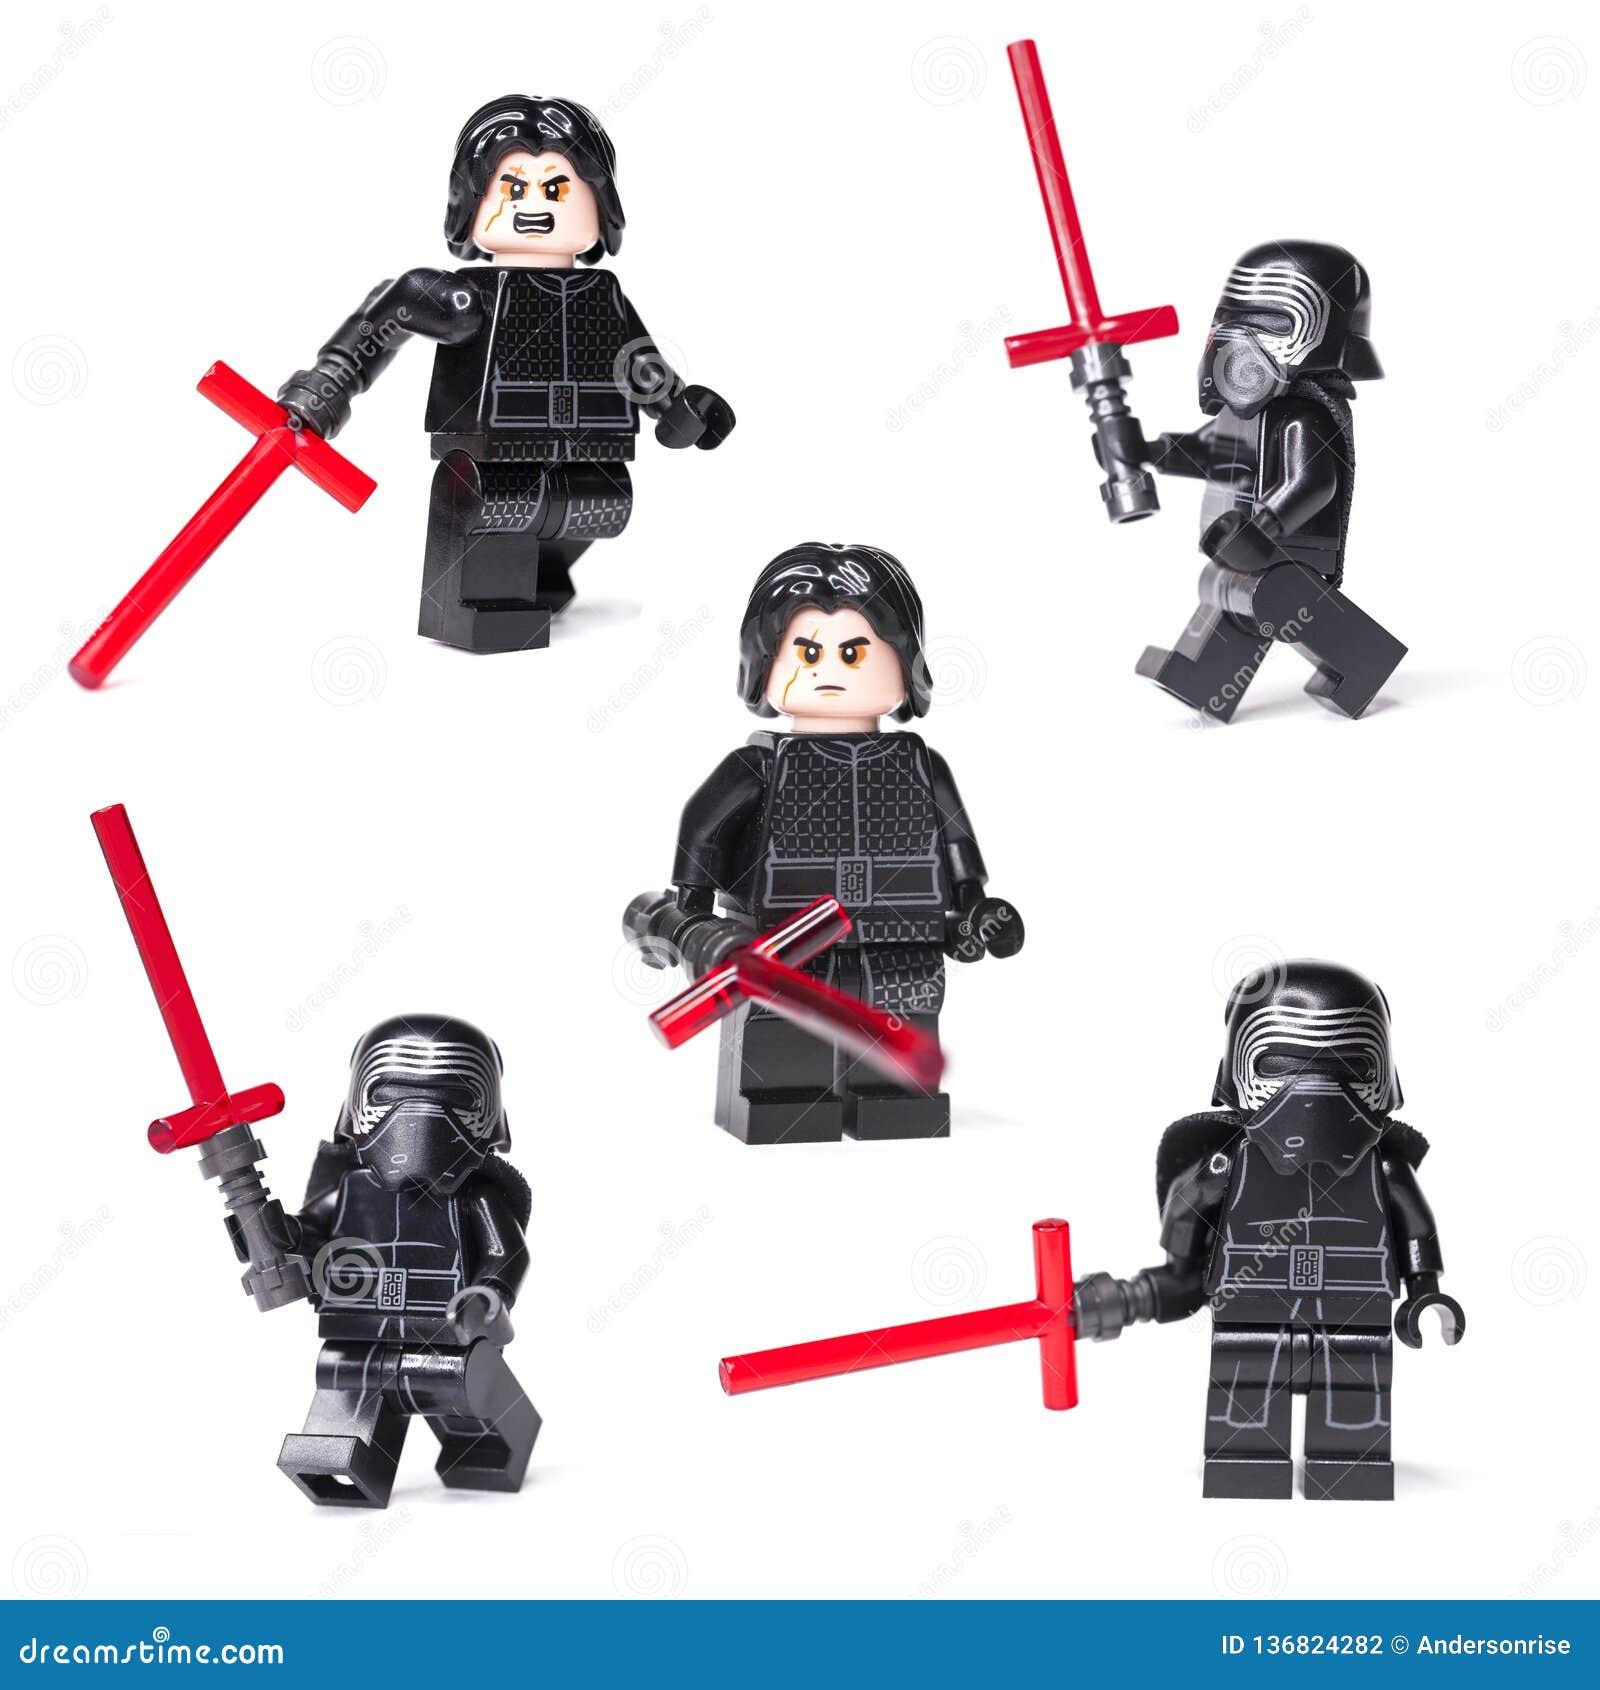 Lego star wars kylo ren mini figures of lego star wars saga